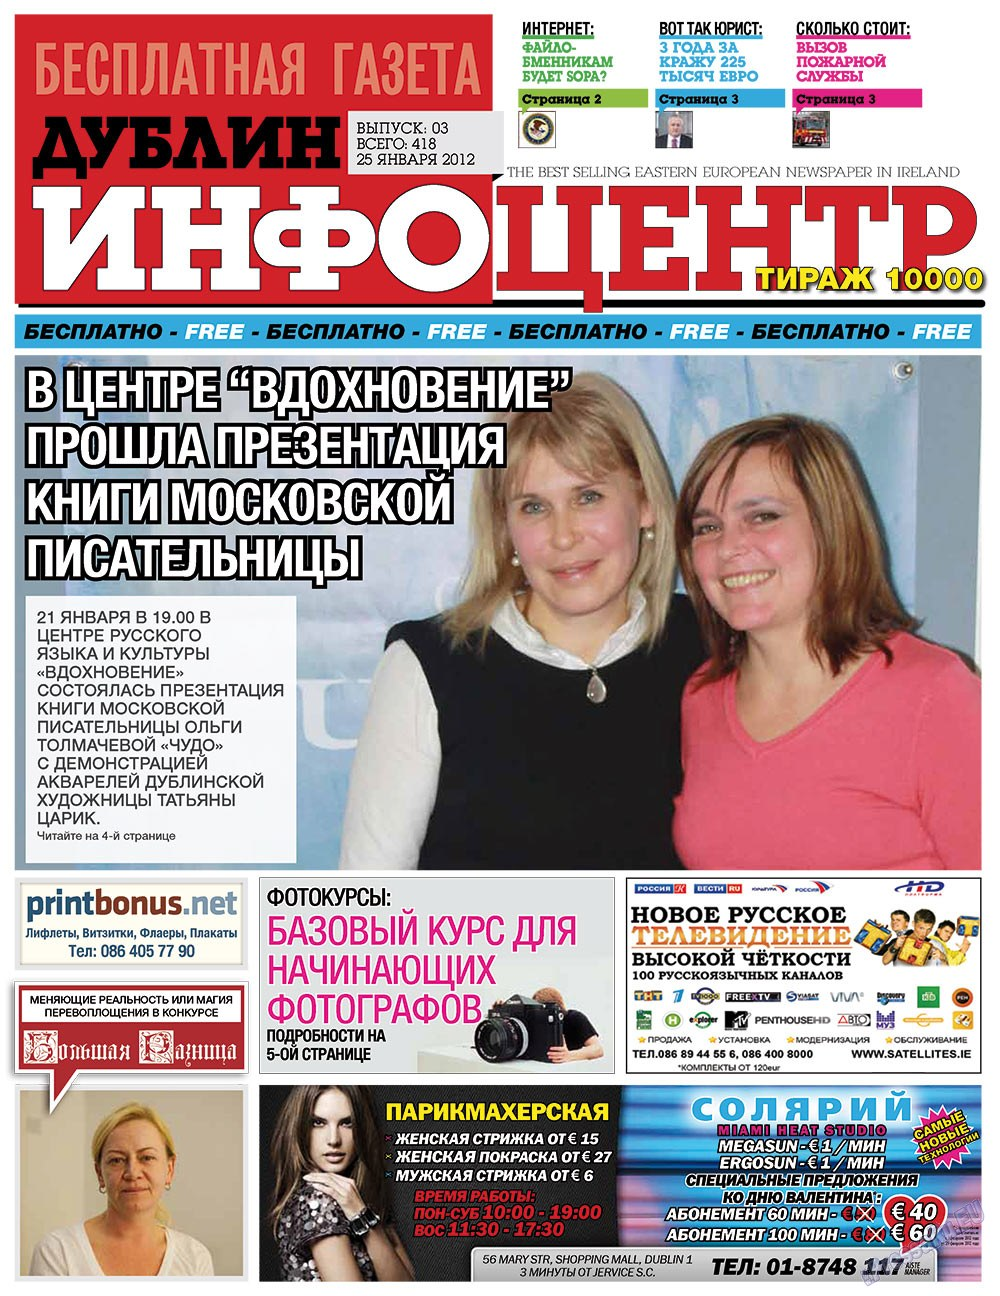 Дублин инфоцентр (газета). 2012 год, номер 3, стр. 1